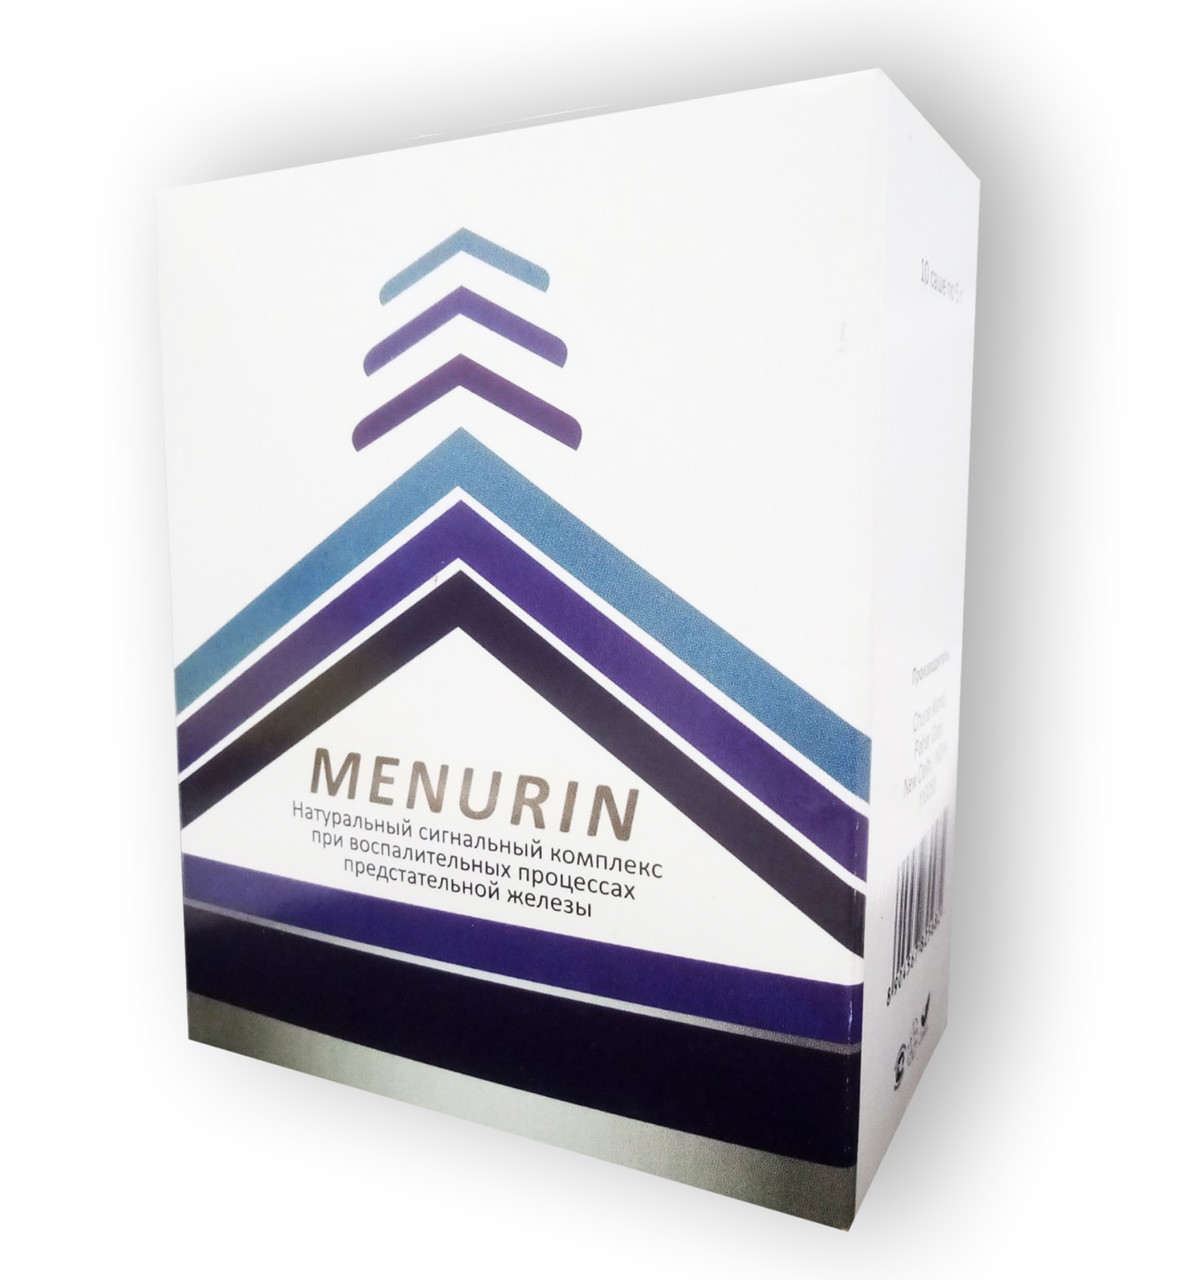 Менурин от простатита Menurin